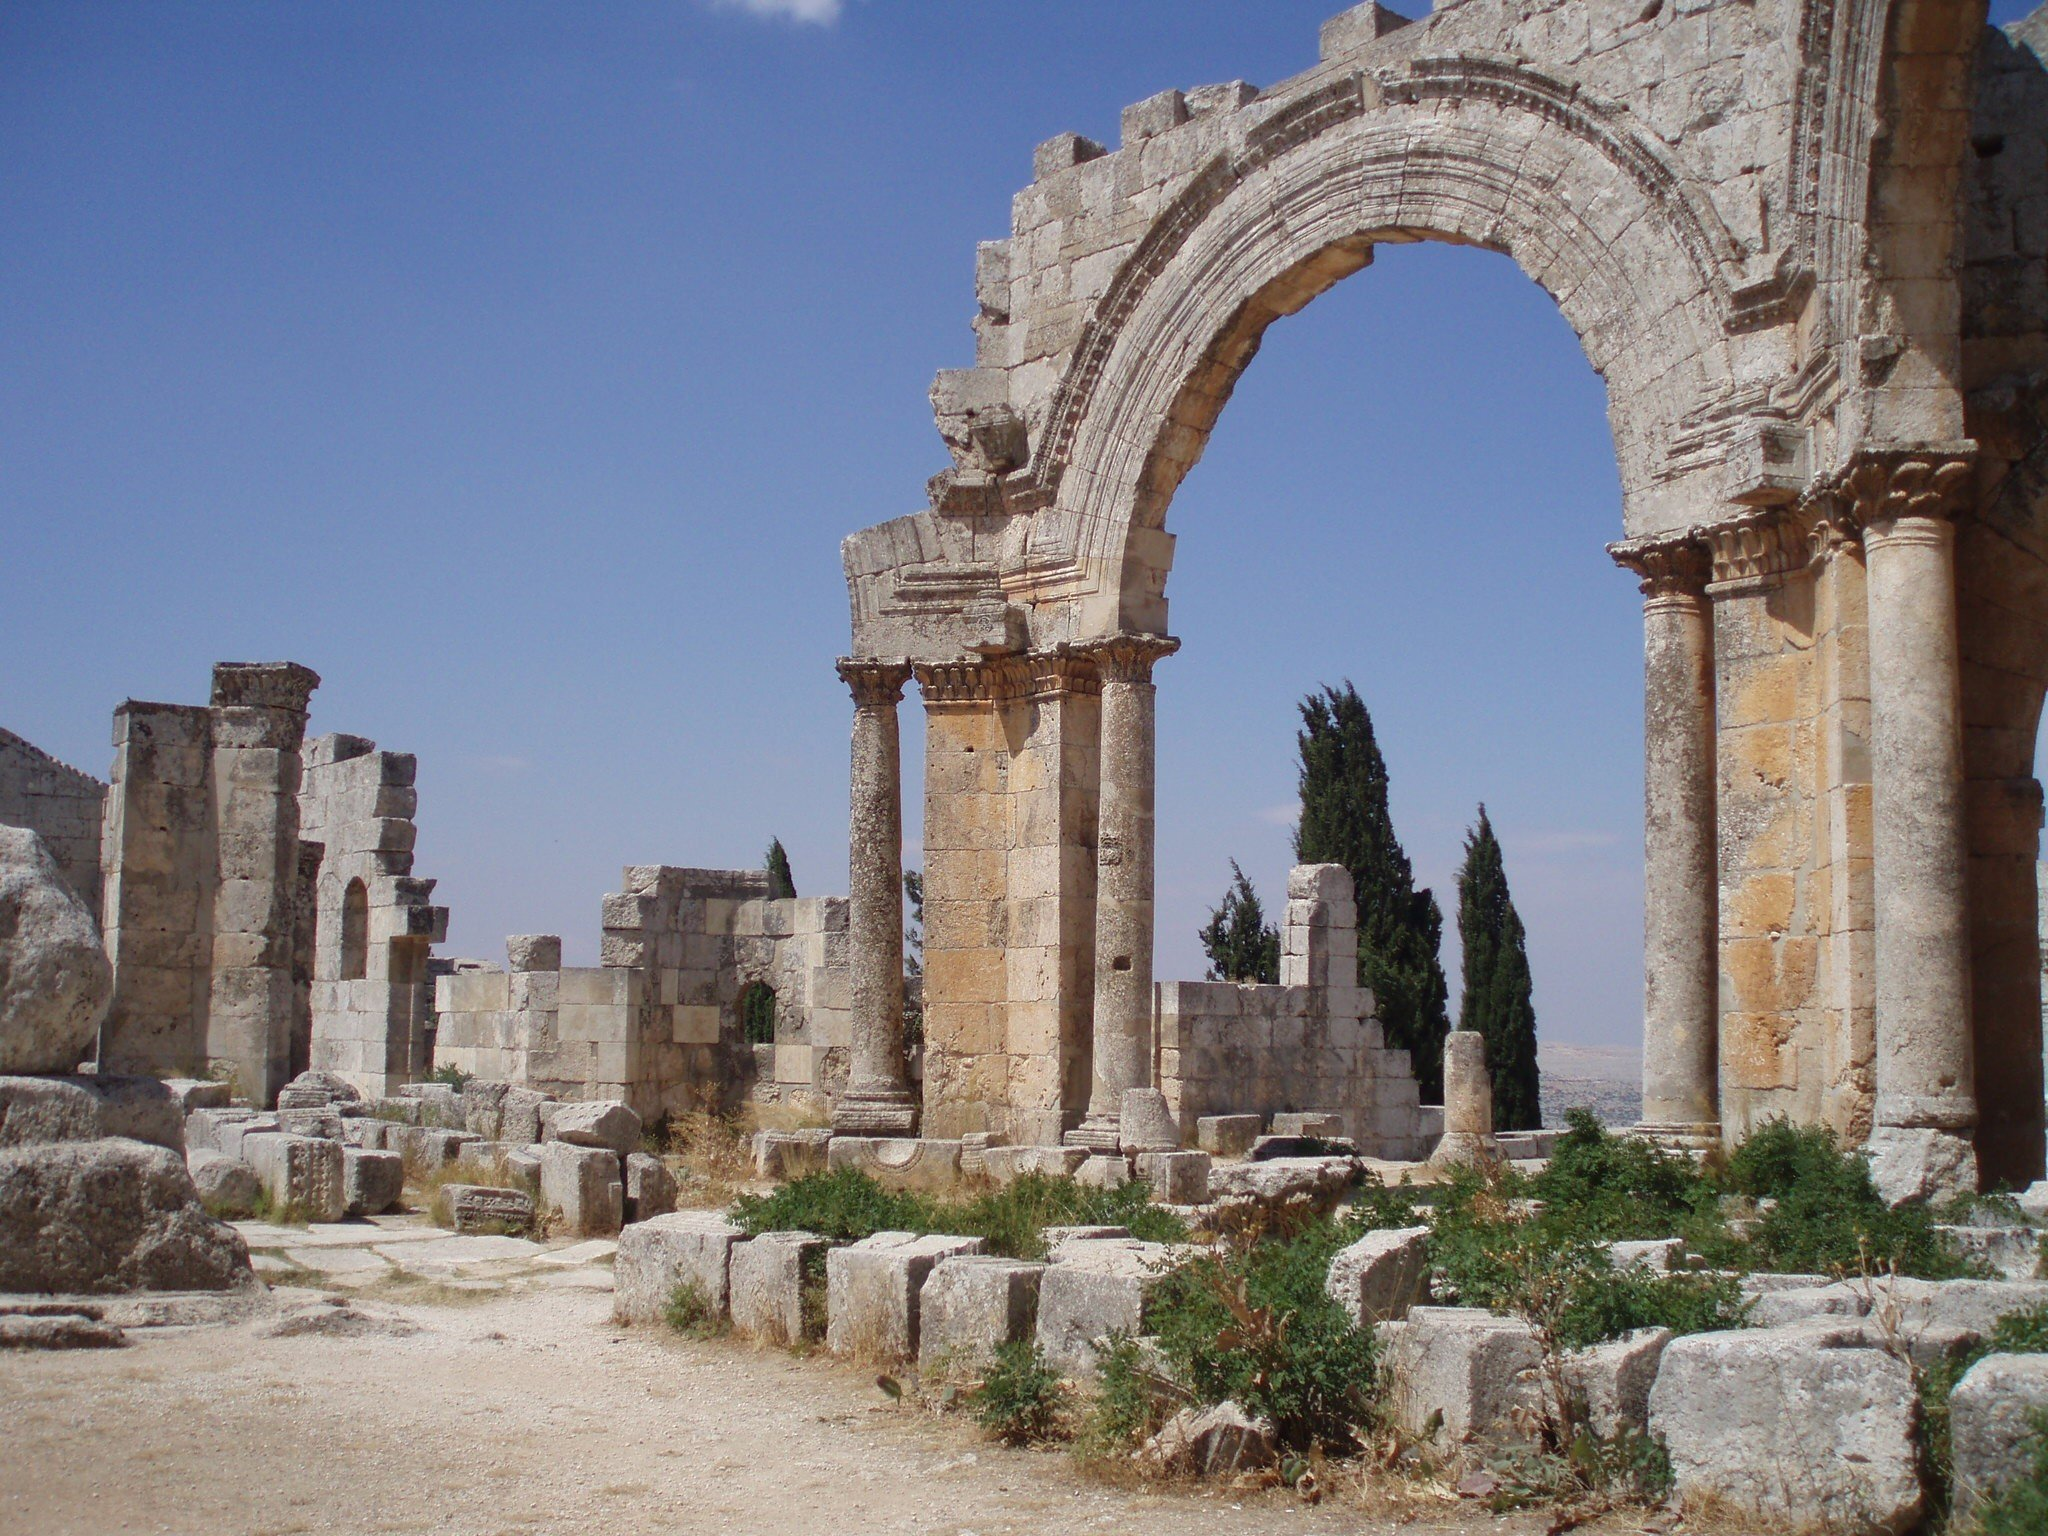 St Simeon's Basilica in Idlib in 2010 (Diana Darke)